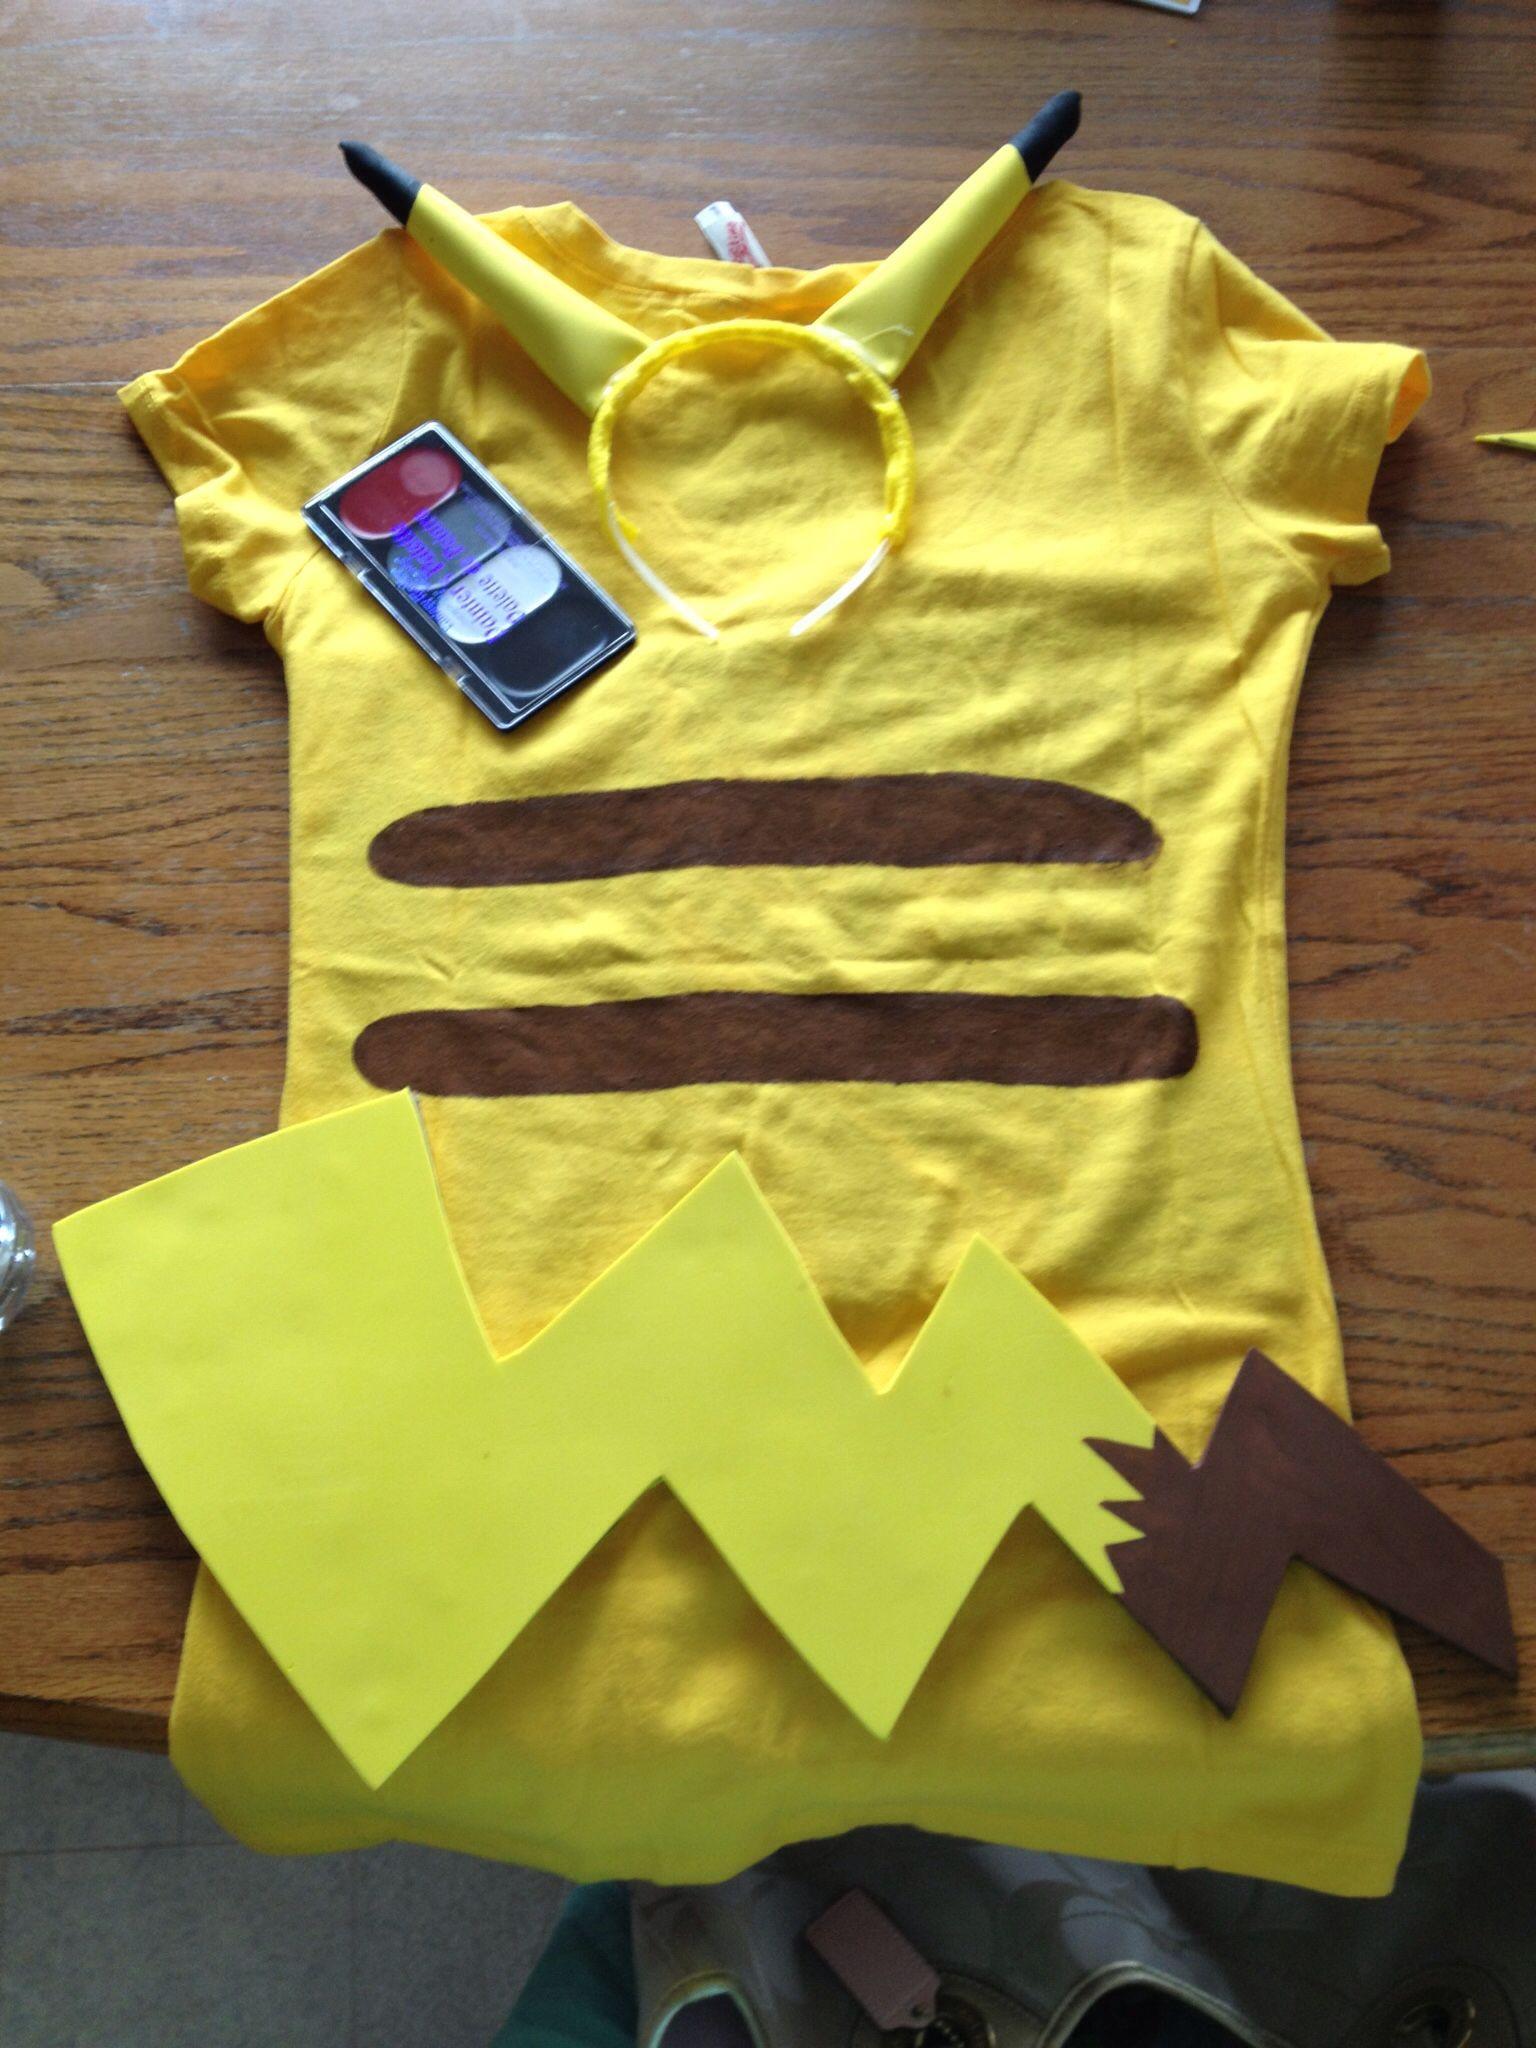 pikachu costume halloween costumes pinterest fasching verkleidung und kost m. Black Bedroom Furniture Sets. Home Design Ideas